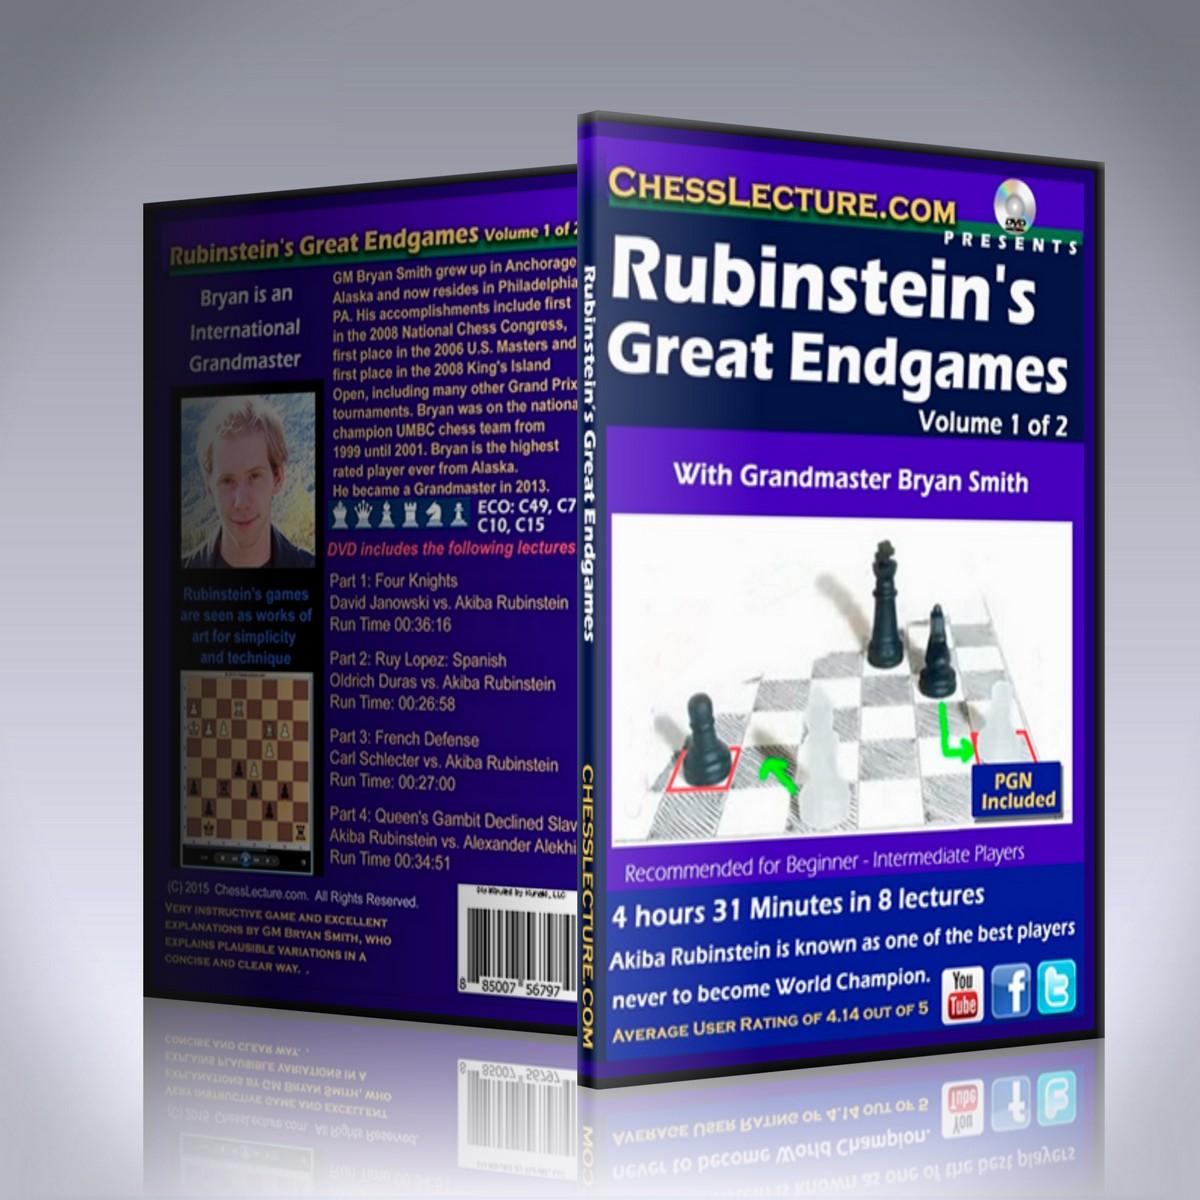 Rubinstein's Great Endgames 2 DVD set – GM Bryan Smith